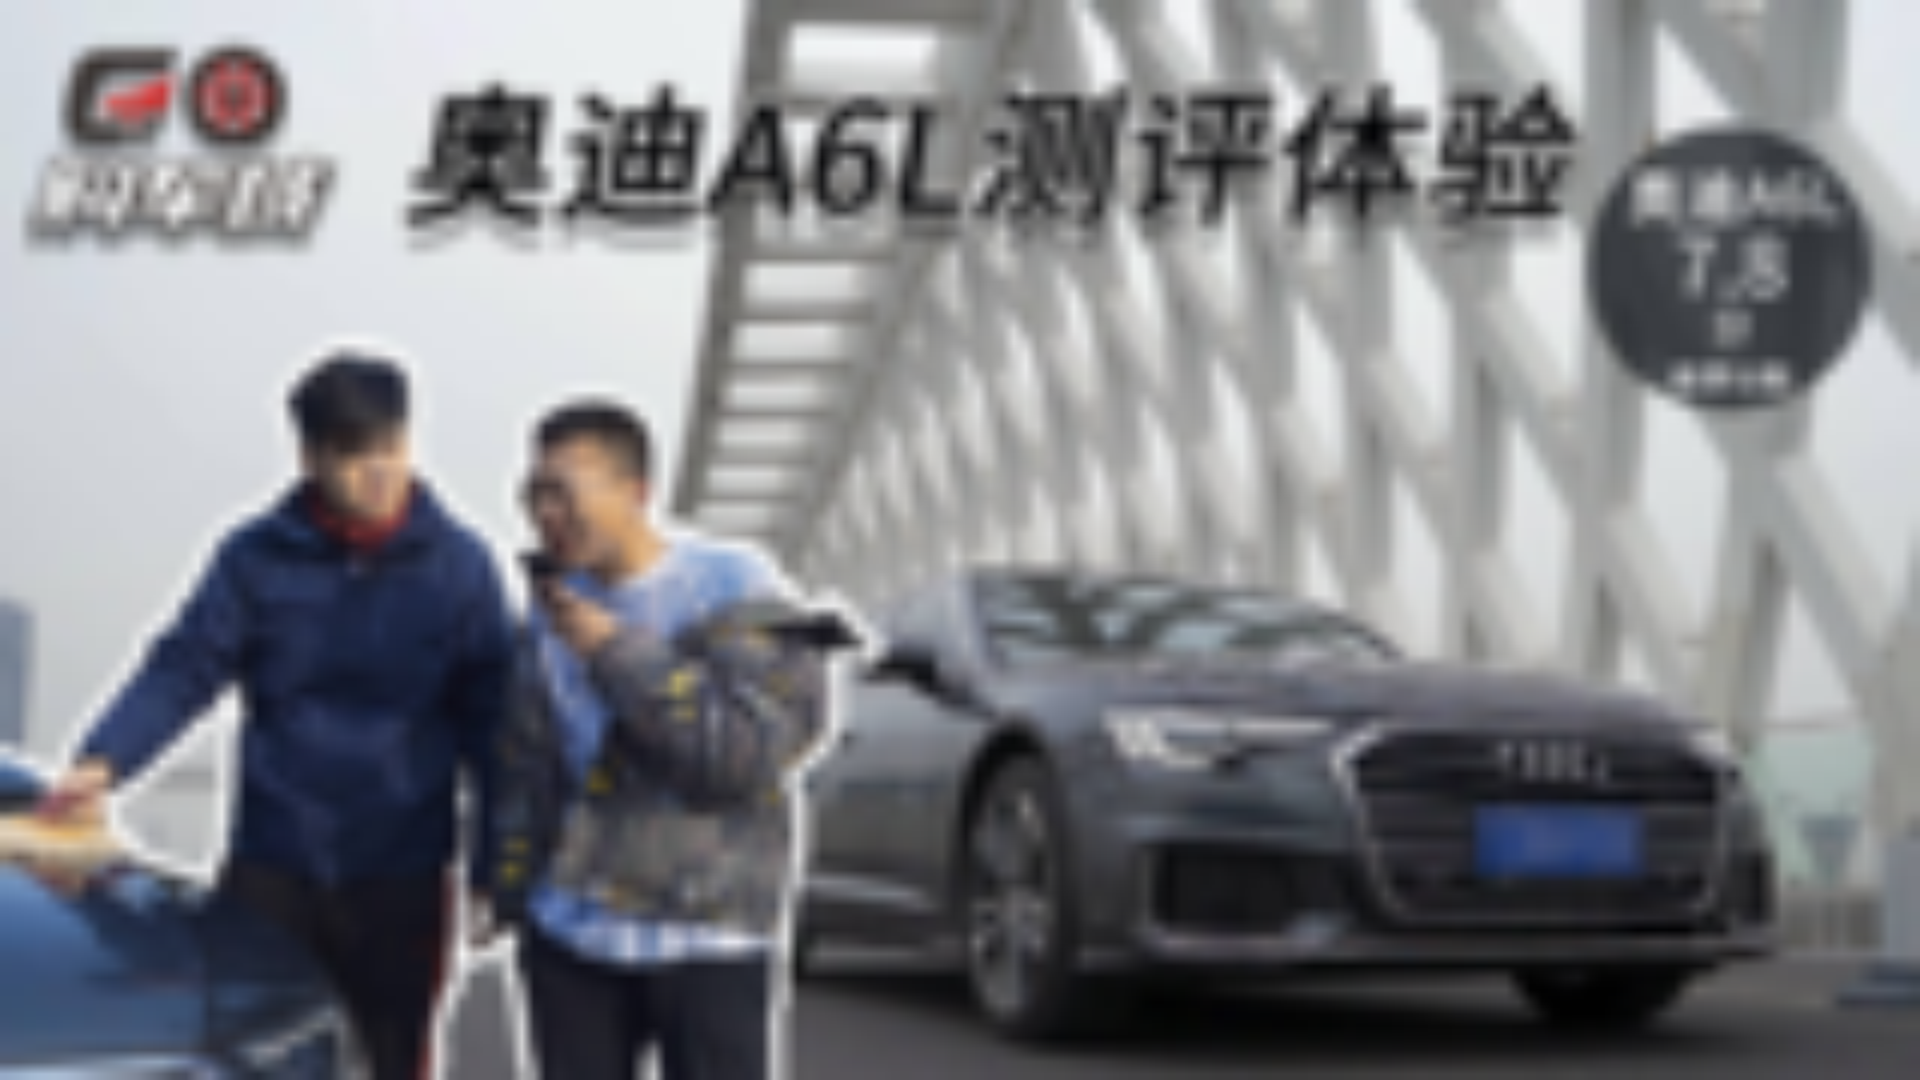 A6L:转型年轻+科技,不再像官车的奥迪老伙计